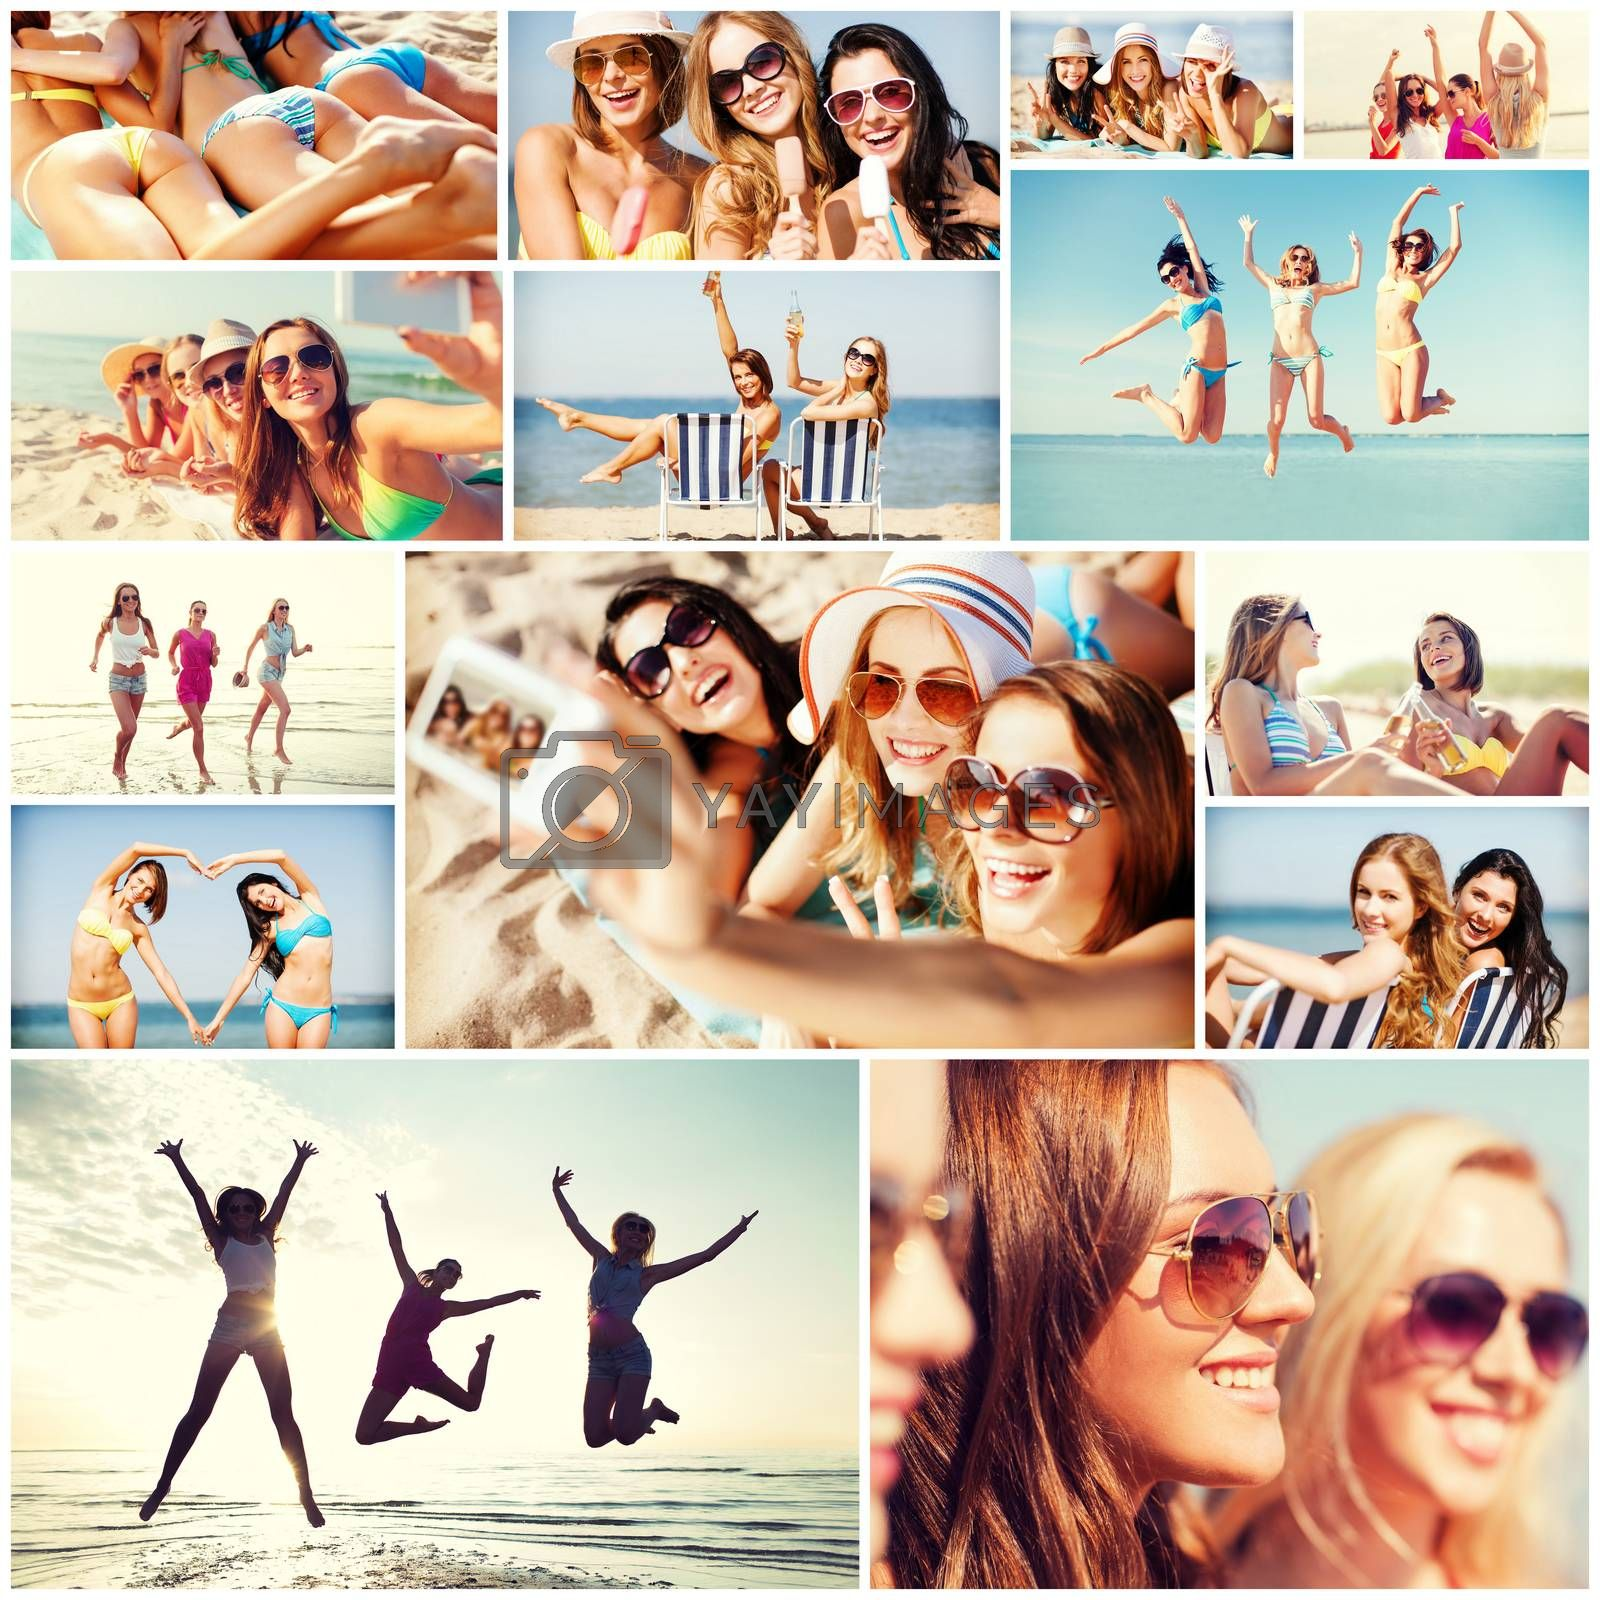 Royalty free image of girls having fun on the beach by dolgachov